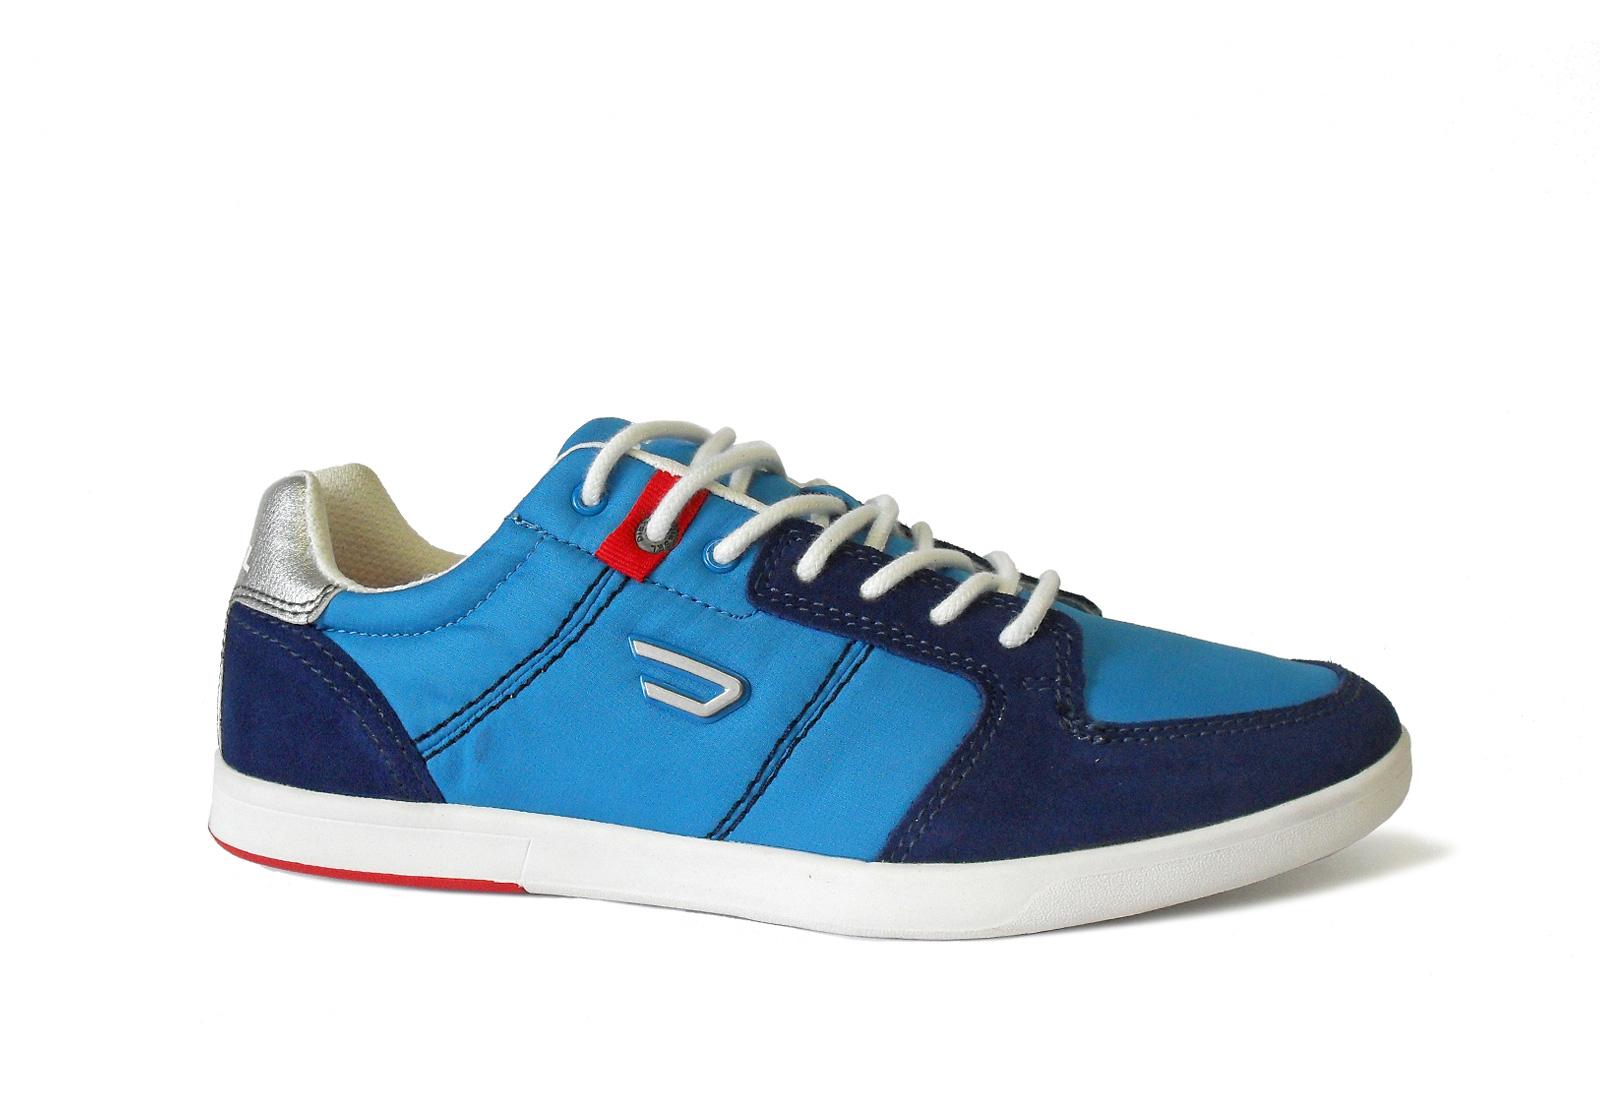 Diesel Shoes - Hutsky - 675-005-4785 - Online shop for ...